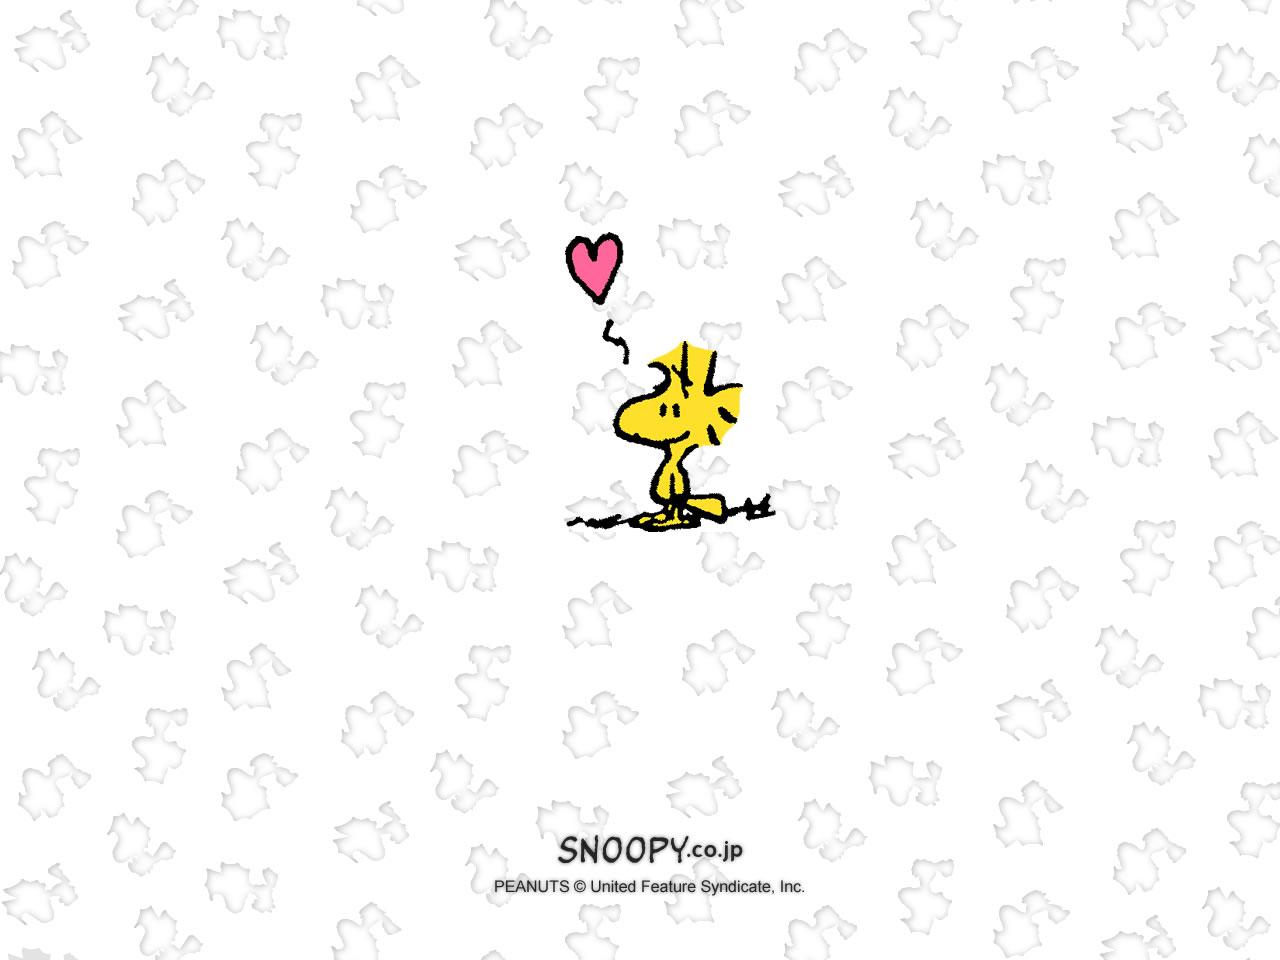 Snoopy Woodstock Snoopy